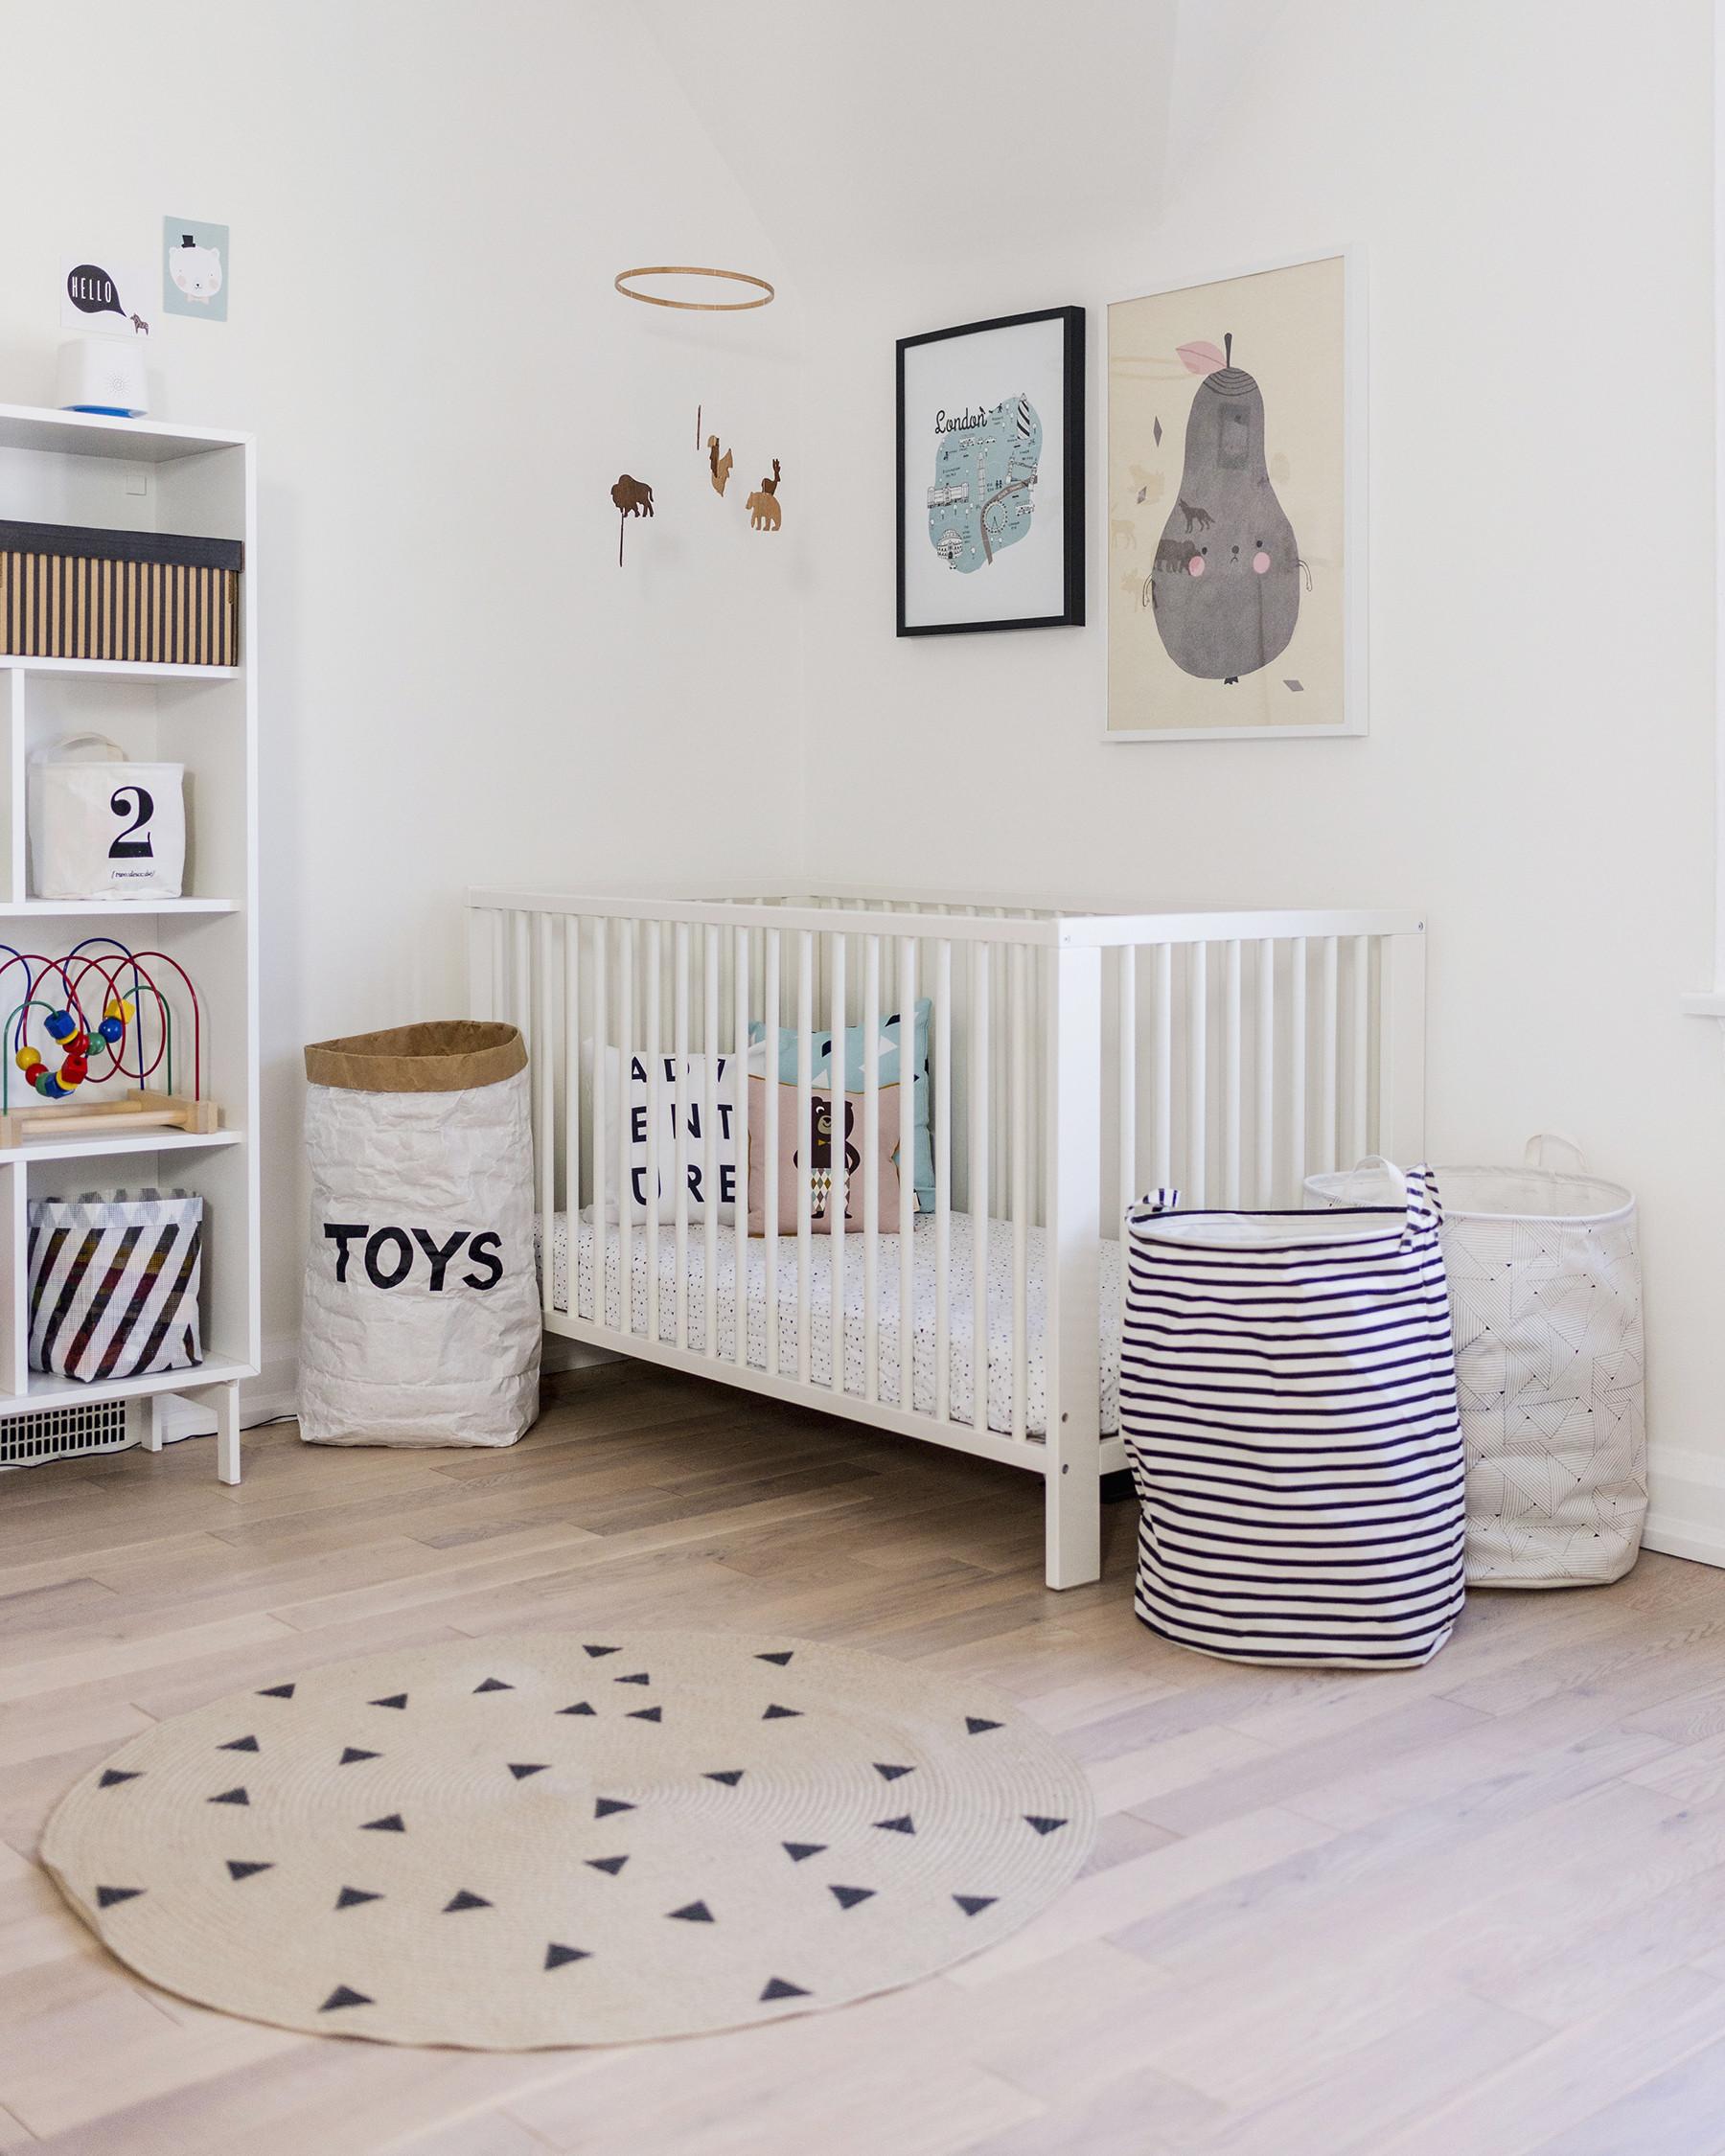 Kids Room Stuff  Favourite Scandinavian Nursery Kids Room Decor Items